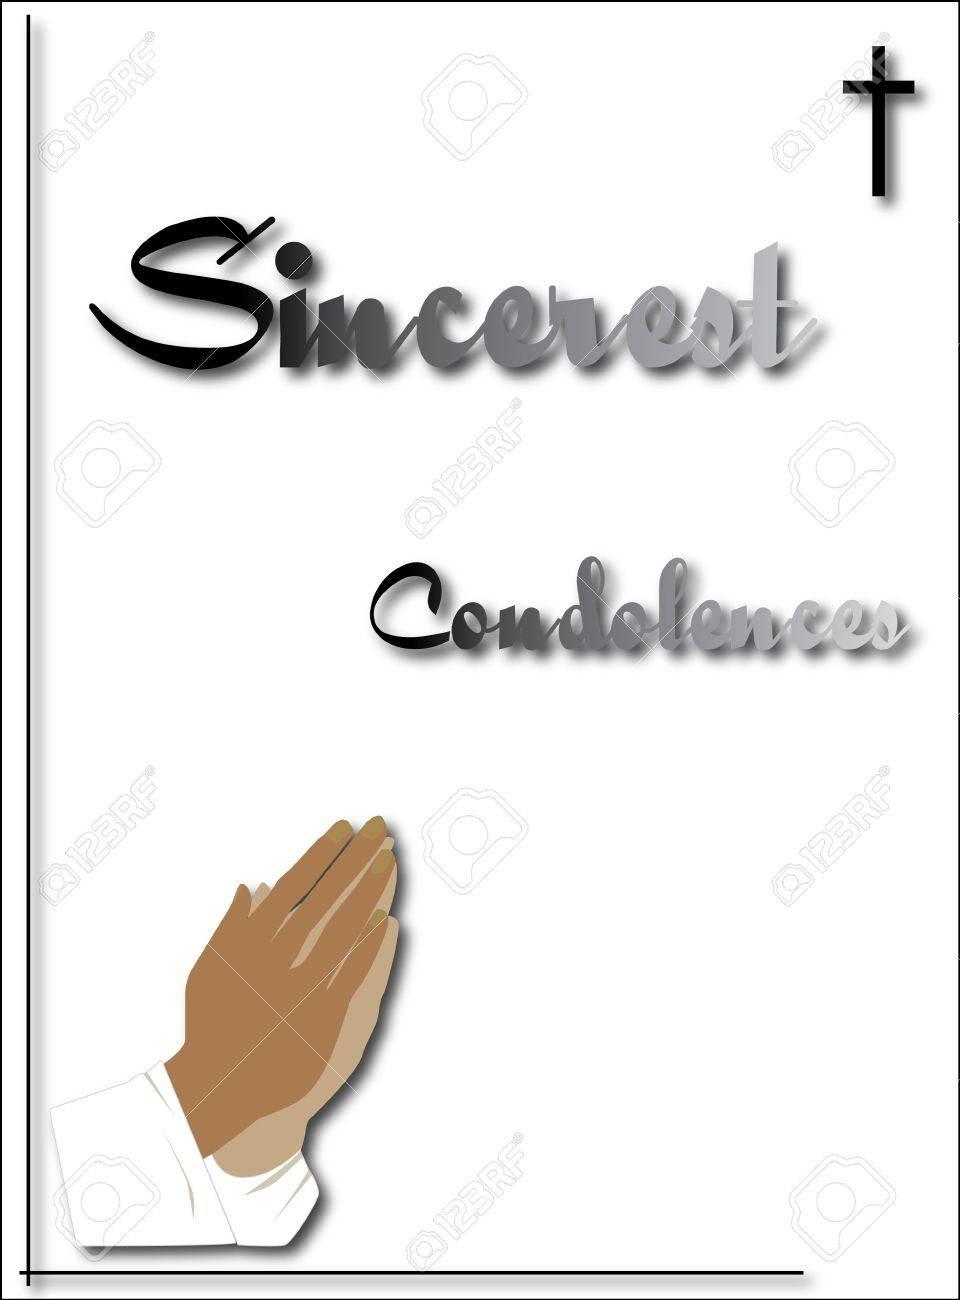 praying hands condolence card royalty free cliparts vectors and